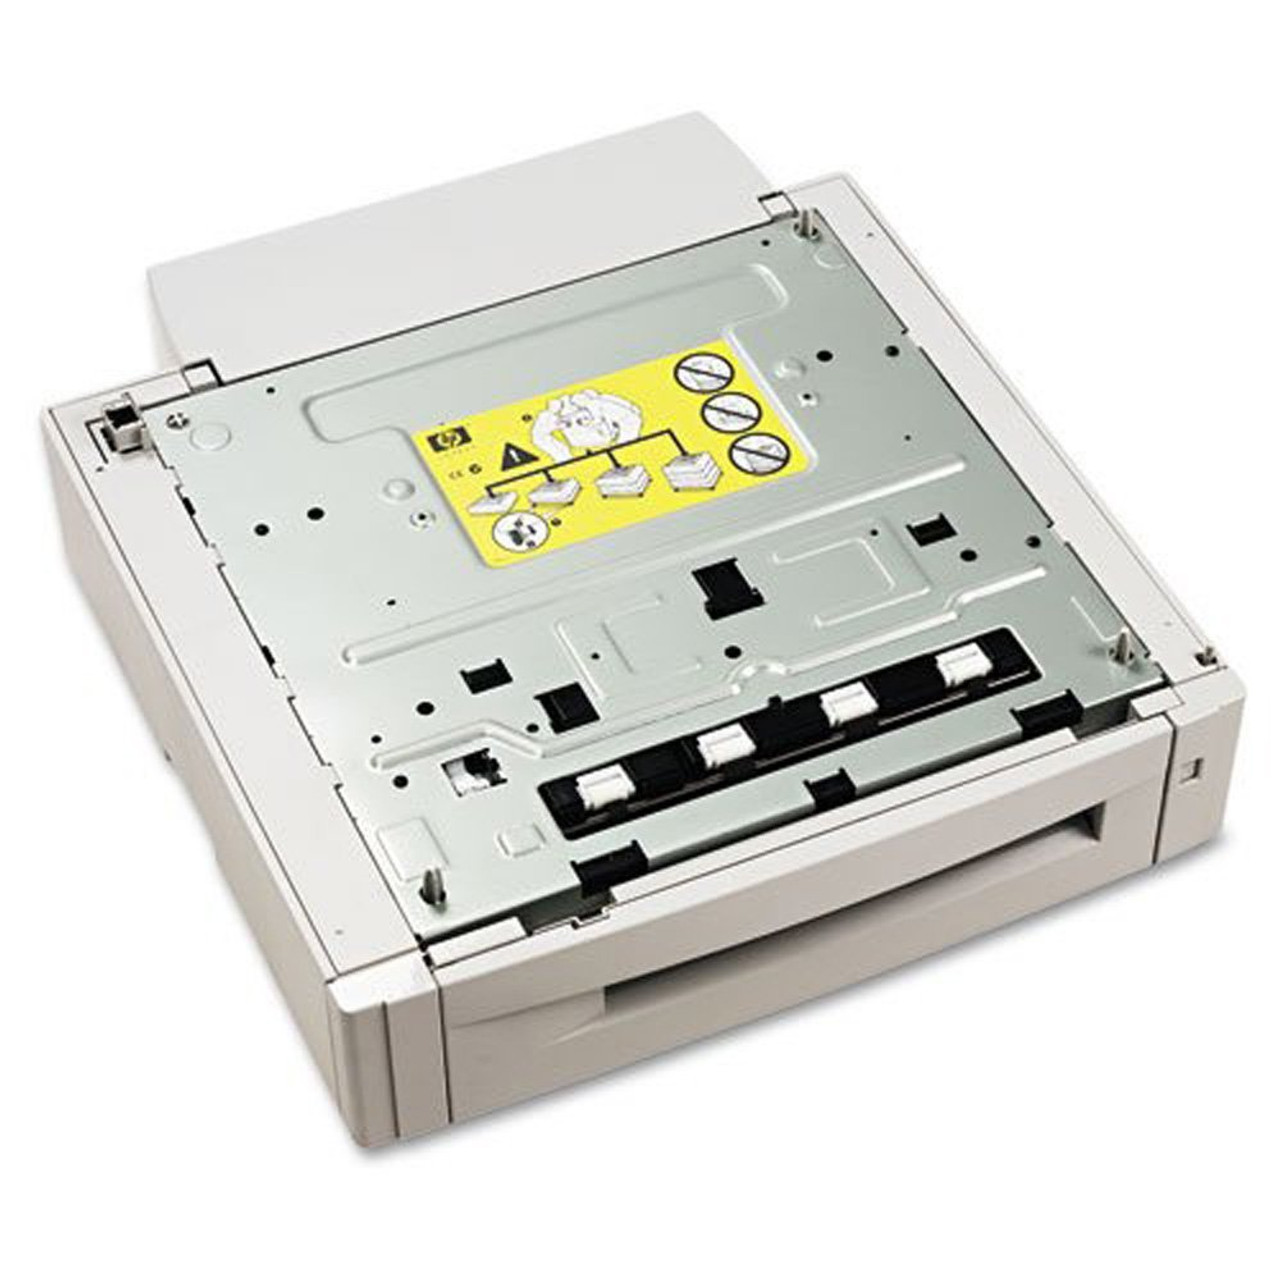 500 Sheet Optional Tray HP Color LaserJet 5550